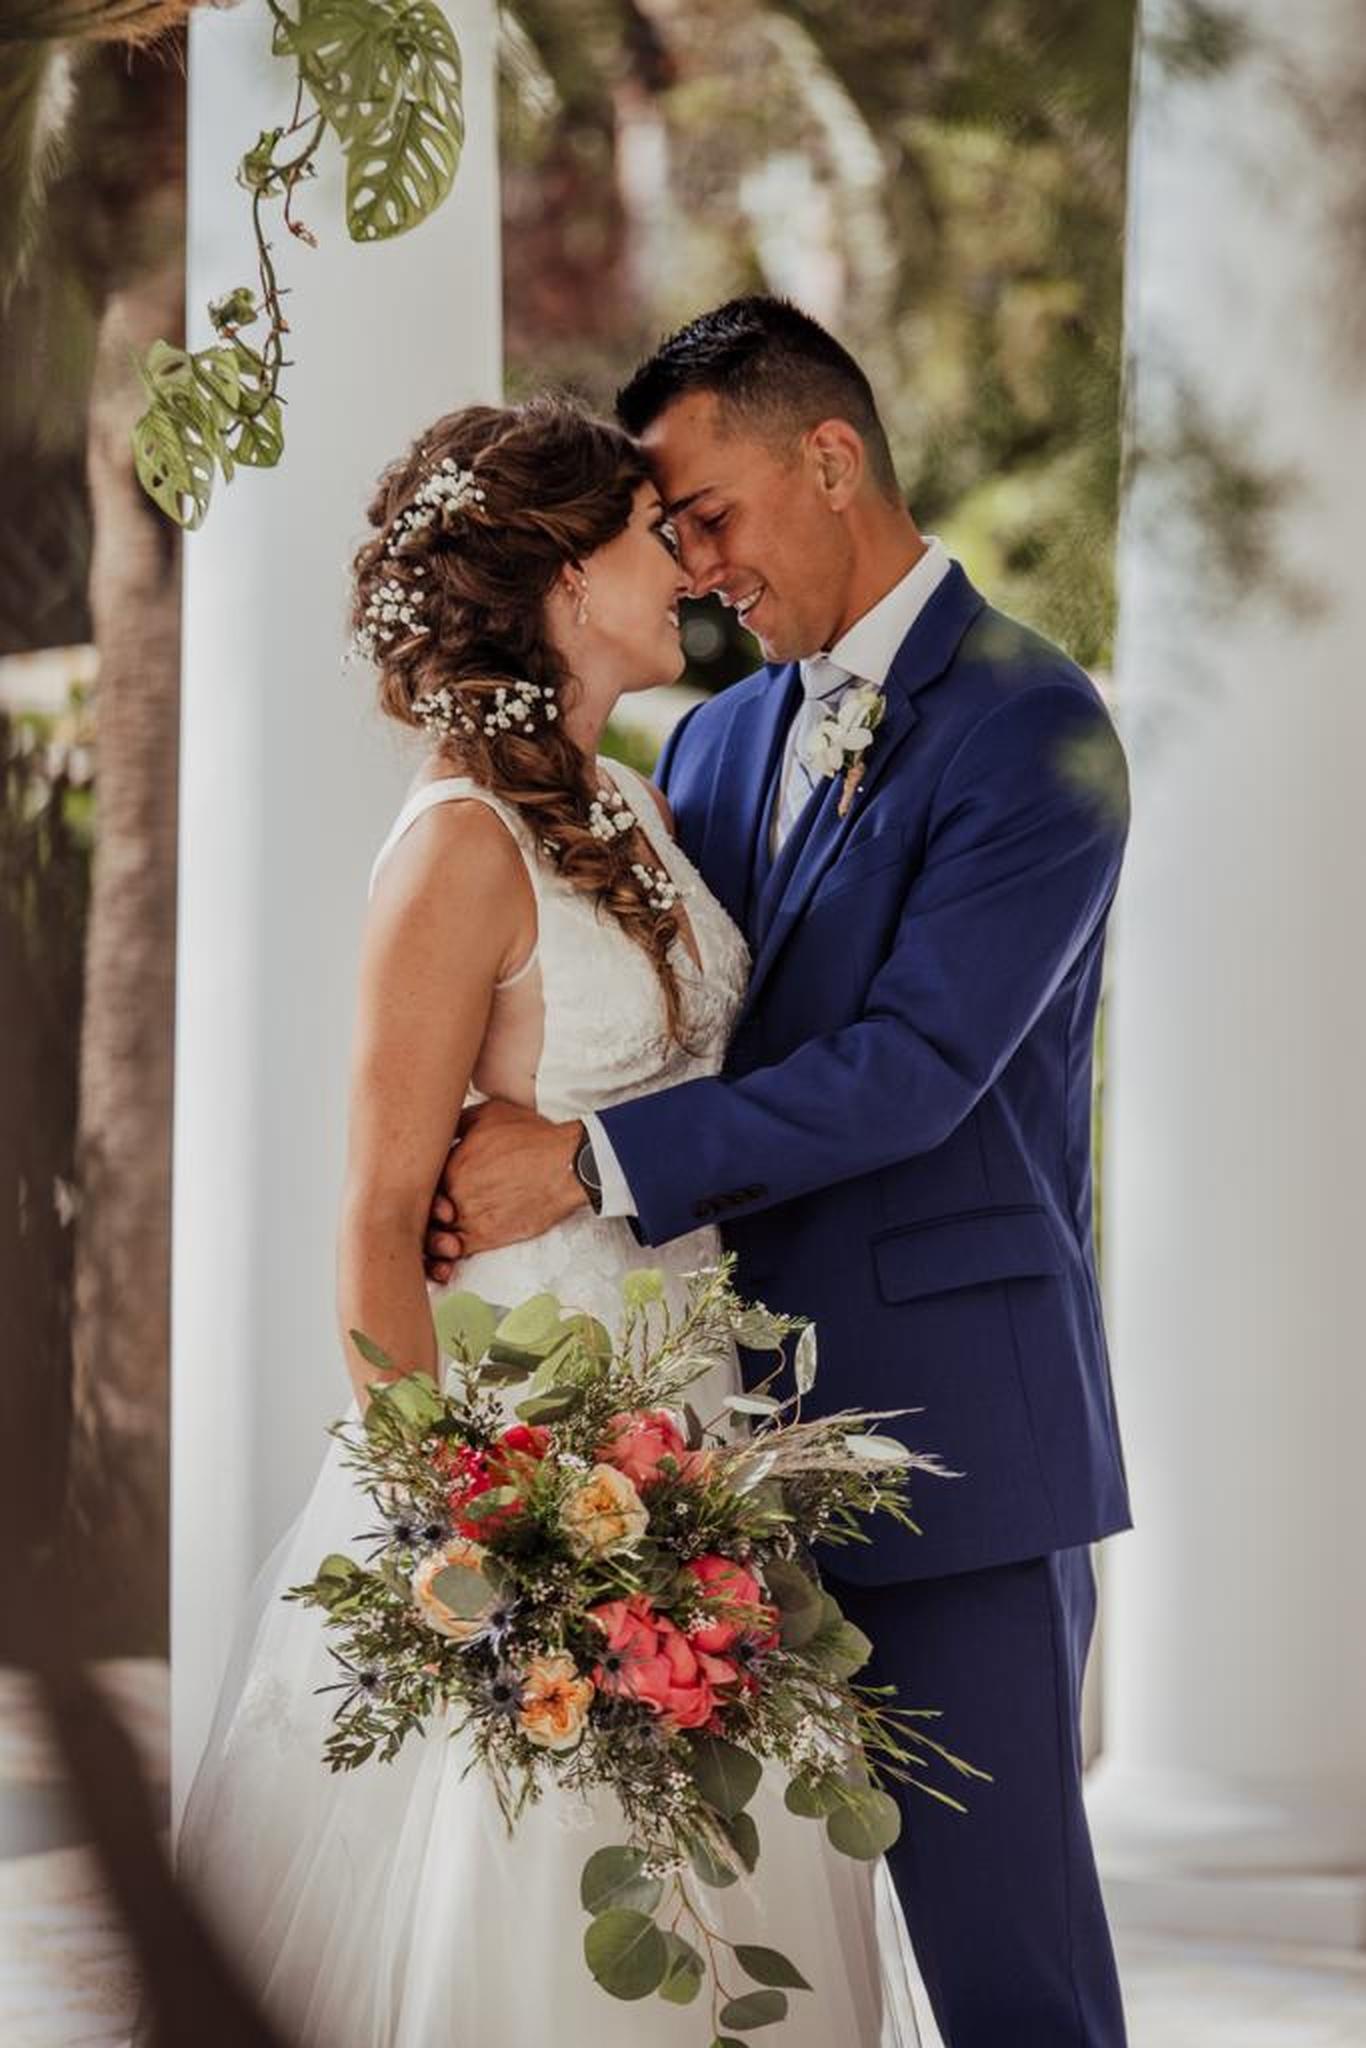 Wedding-bouquet-loose-peonies-and-roses.jpg